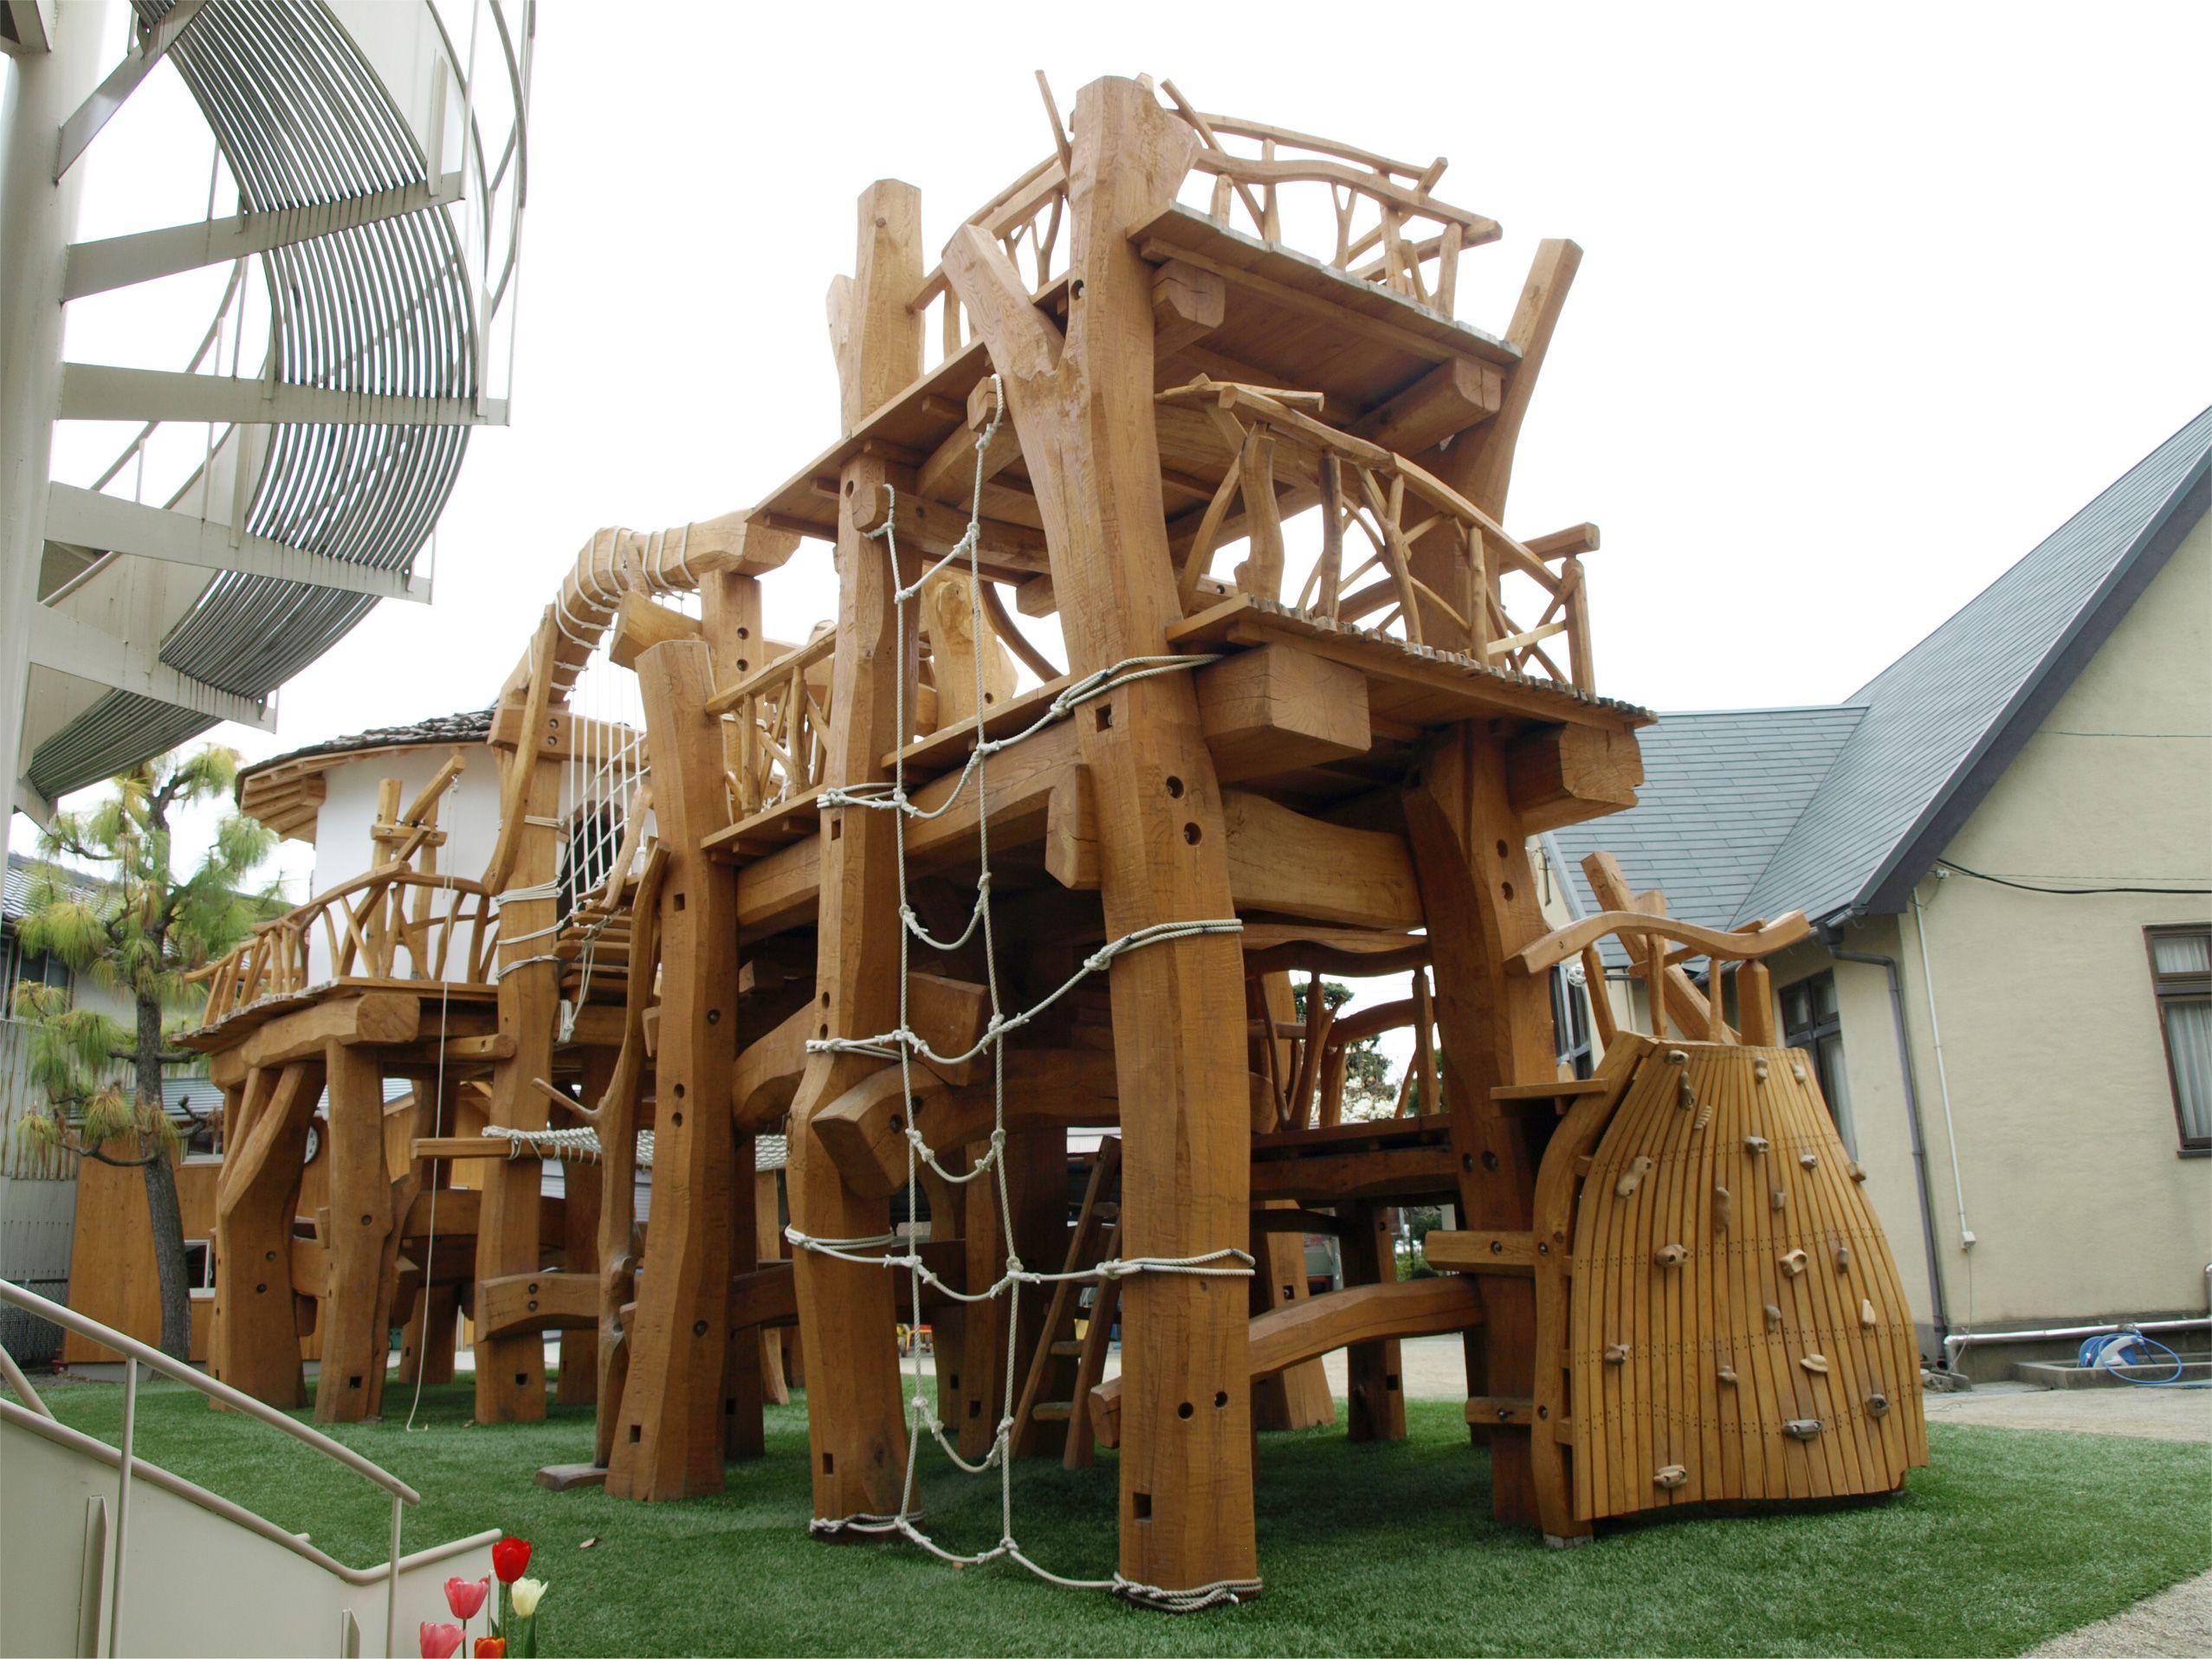 The Minakuchi Kindergarten S Wooden Playgroubd Wooden